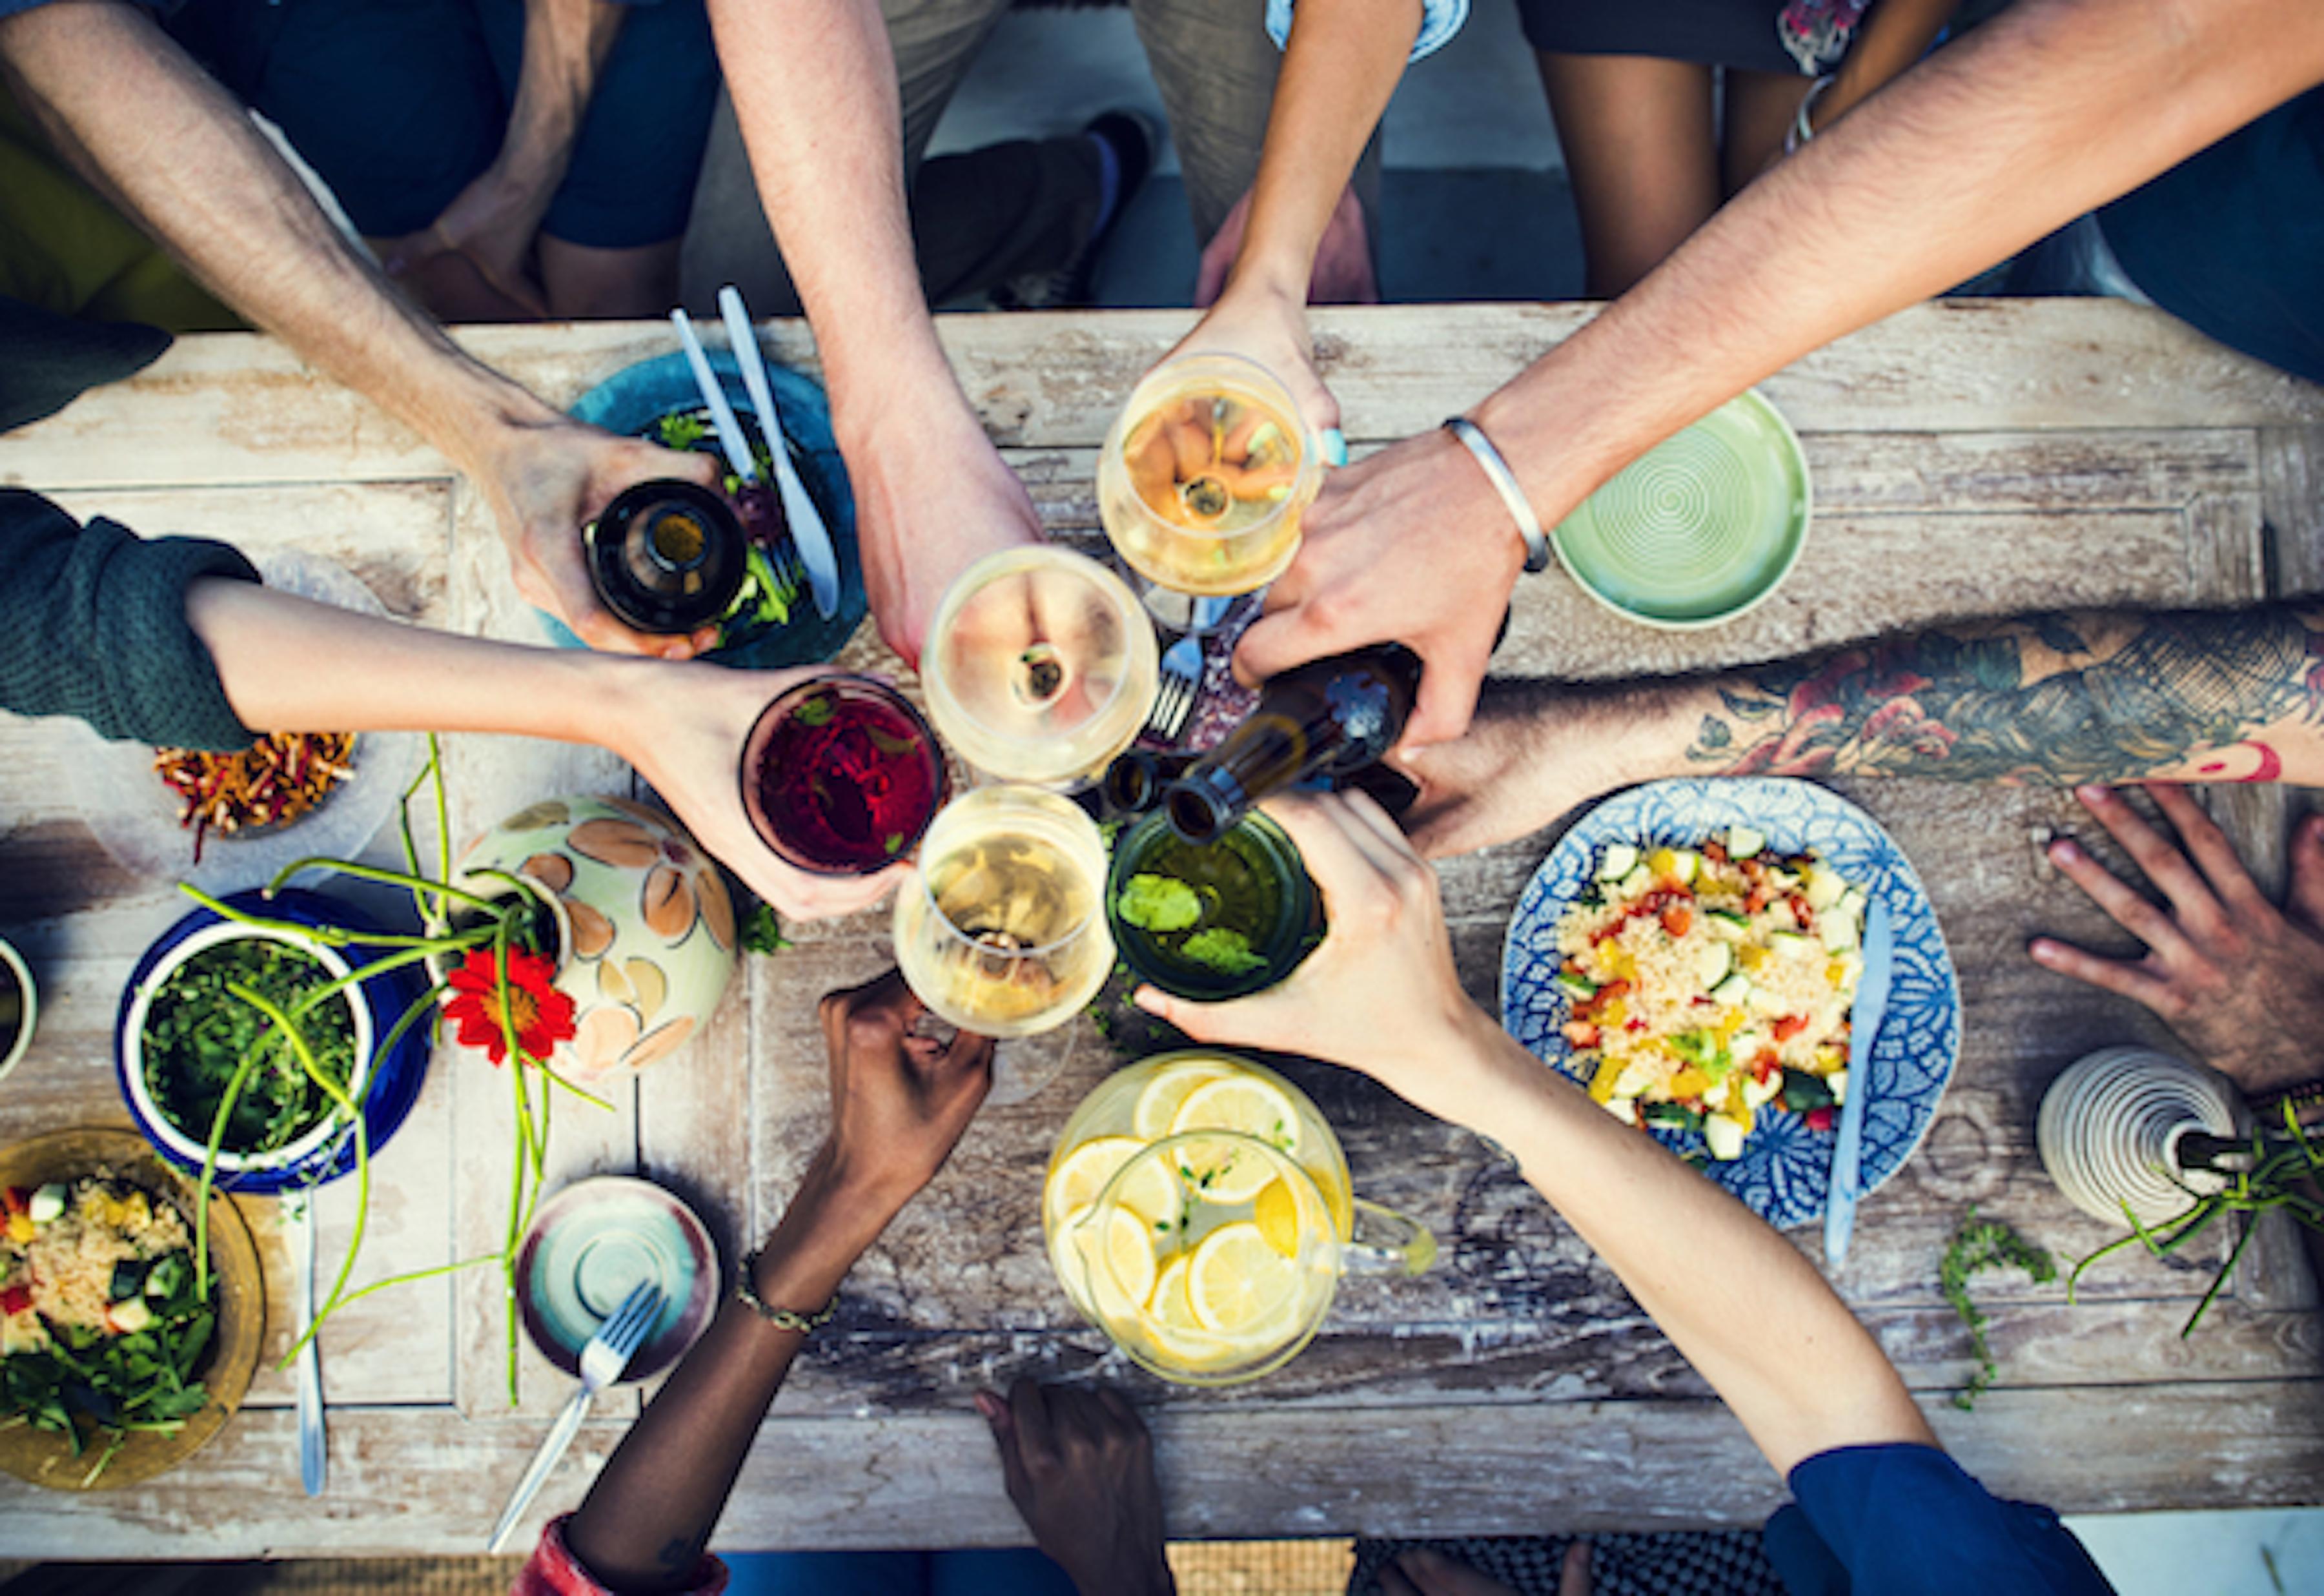 10 Austin startups feeding the food industry